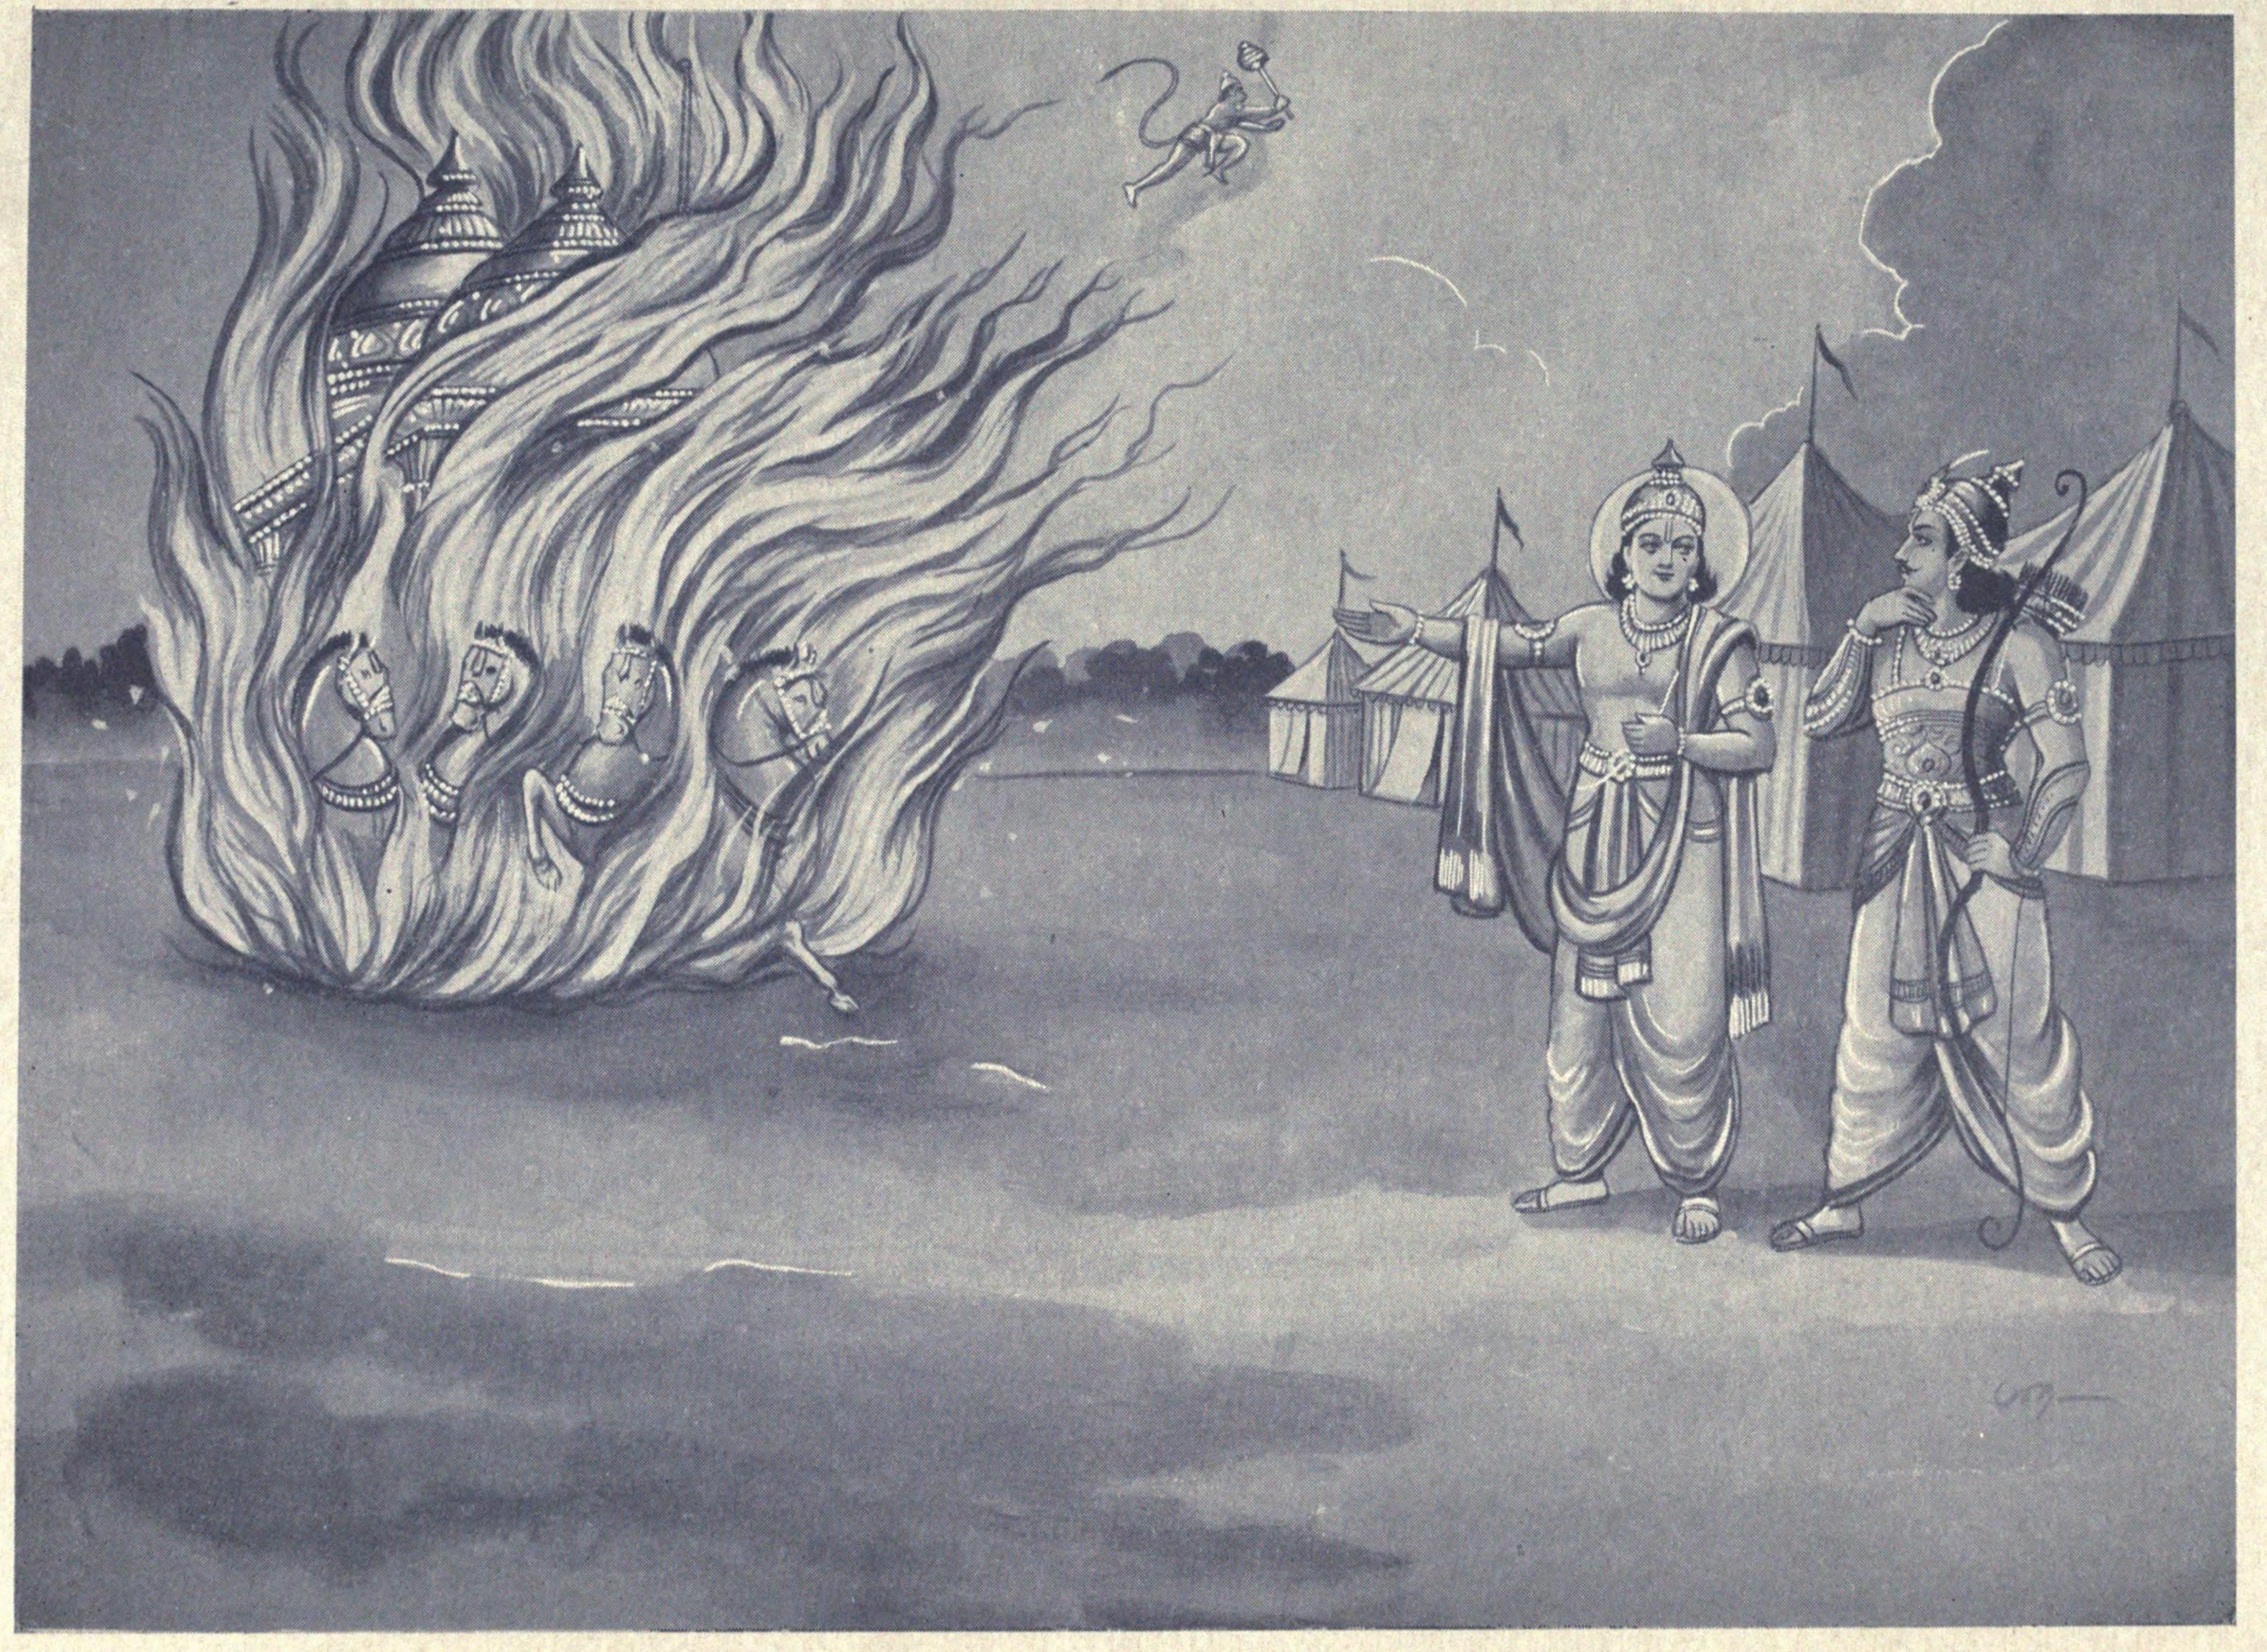 File:Arjuna's chariot burns after the war.jpg